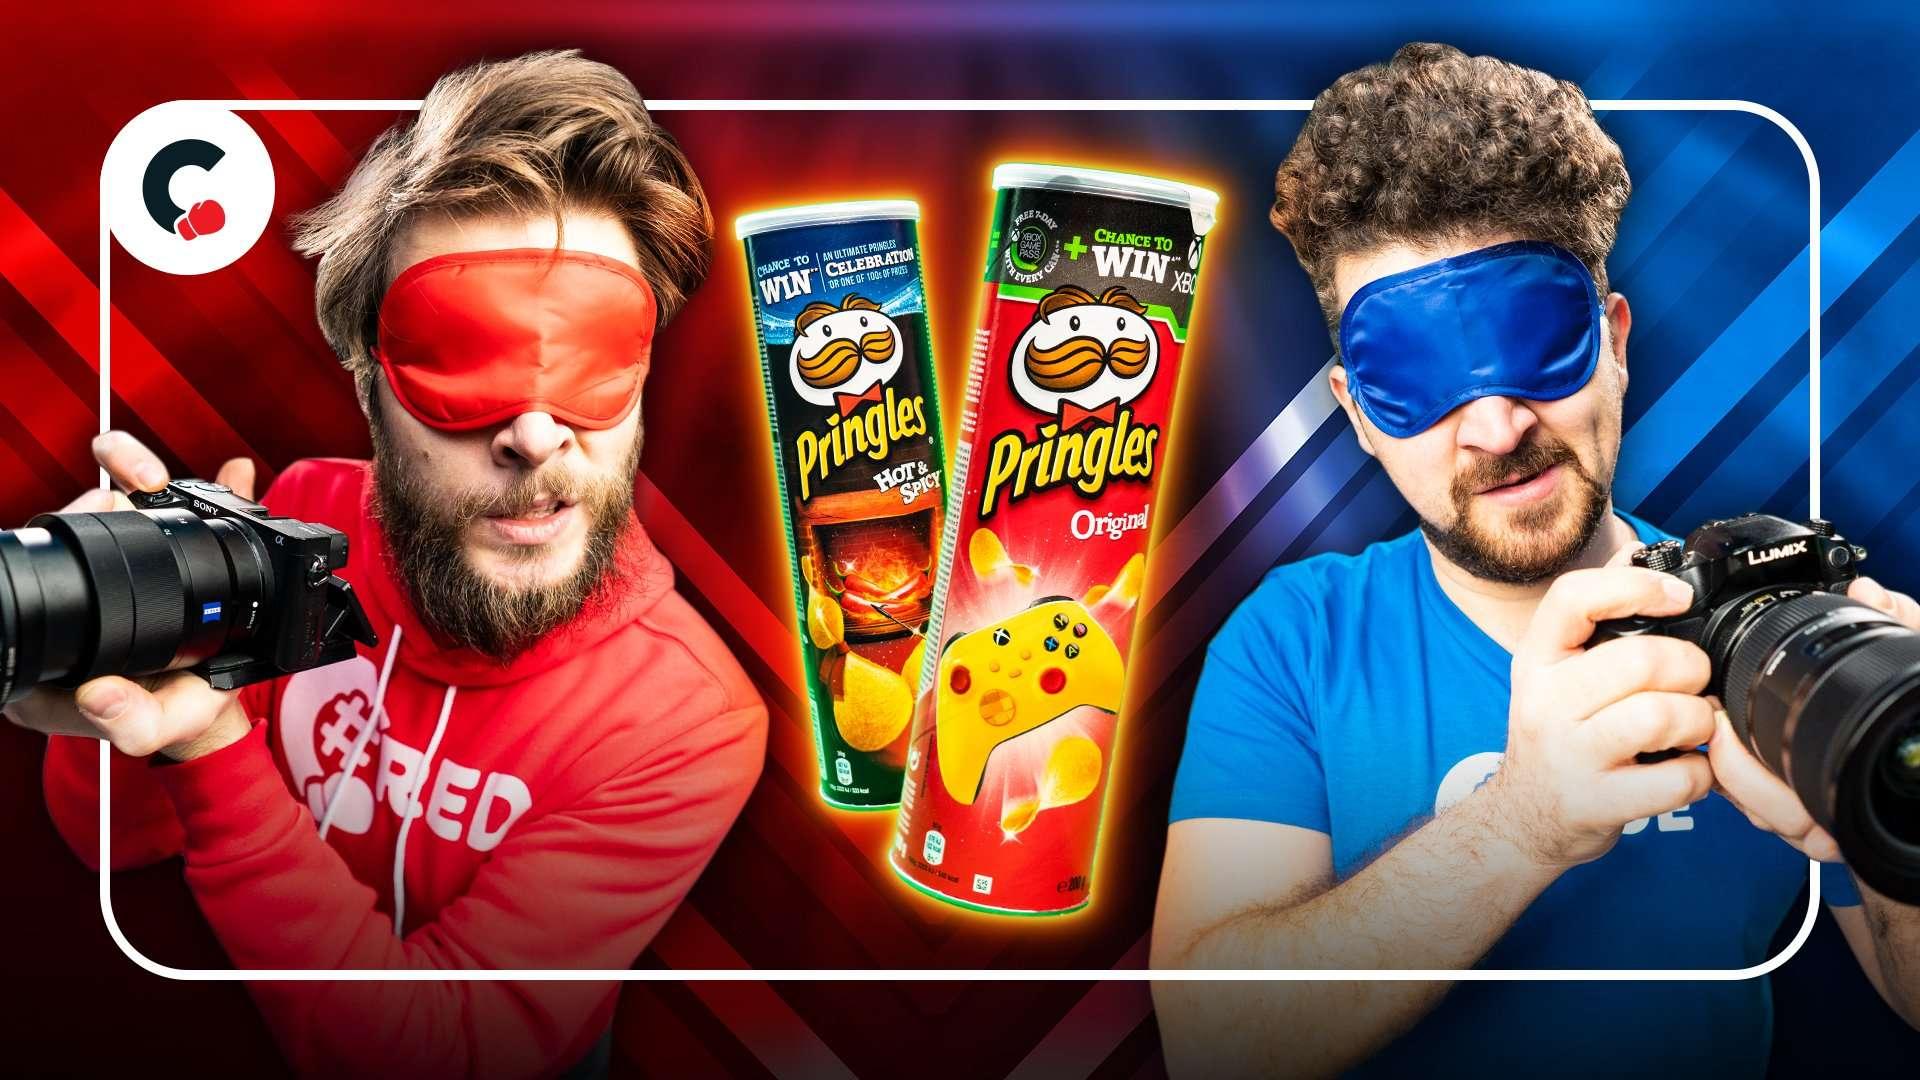 Making a Commercial Blindfolded CineBattle